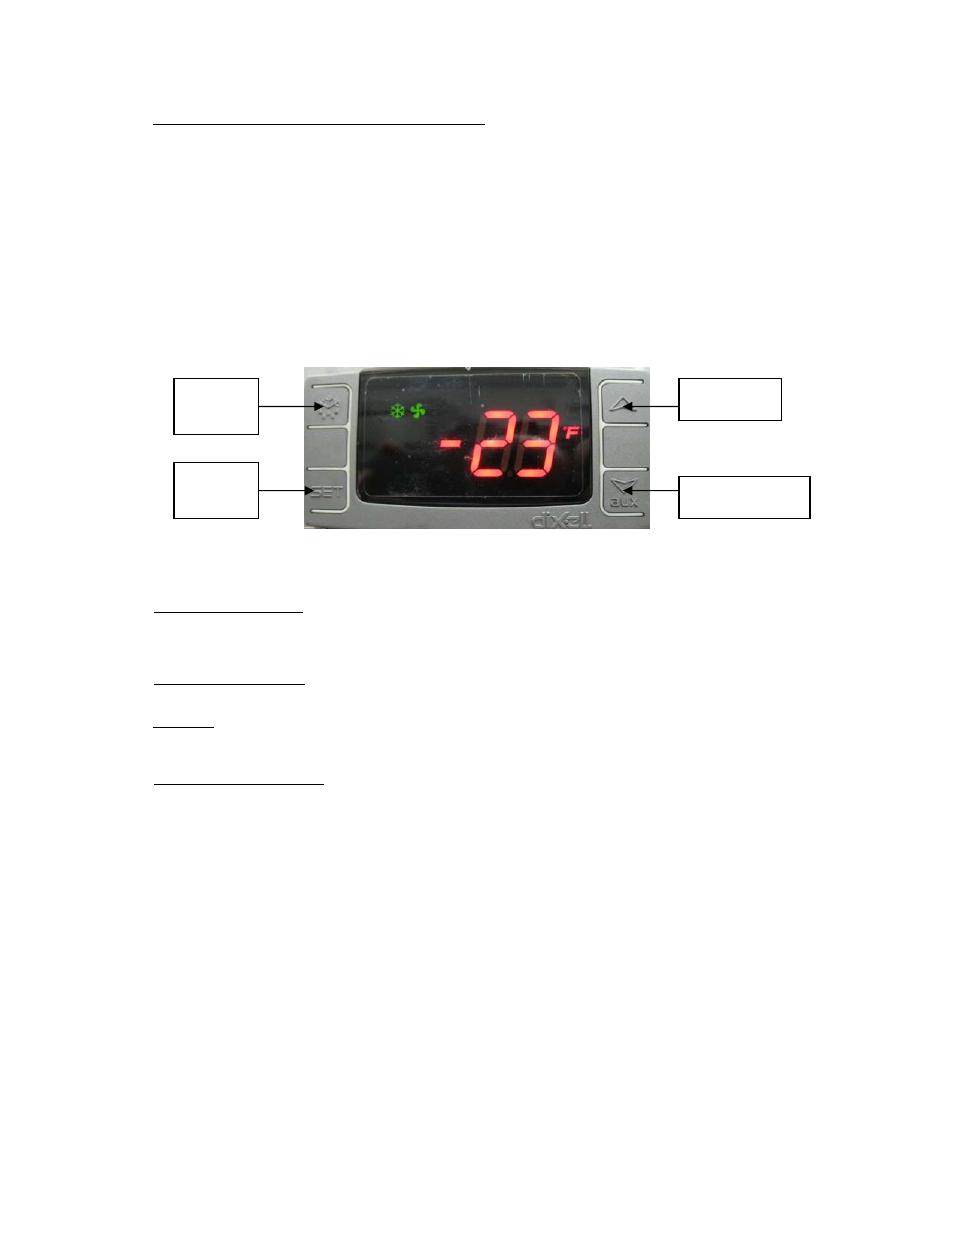 Beverage Air E Series Manual One Word Quickstart Guide Book Cooler Wiring Diagram Defrost Button Up Arrow Set Down Rh Manualsdir Com Bm23 Parts Mt45